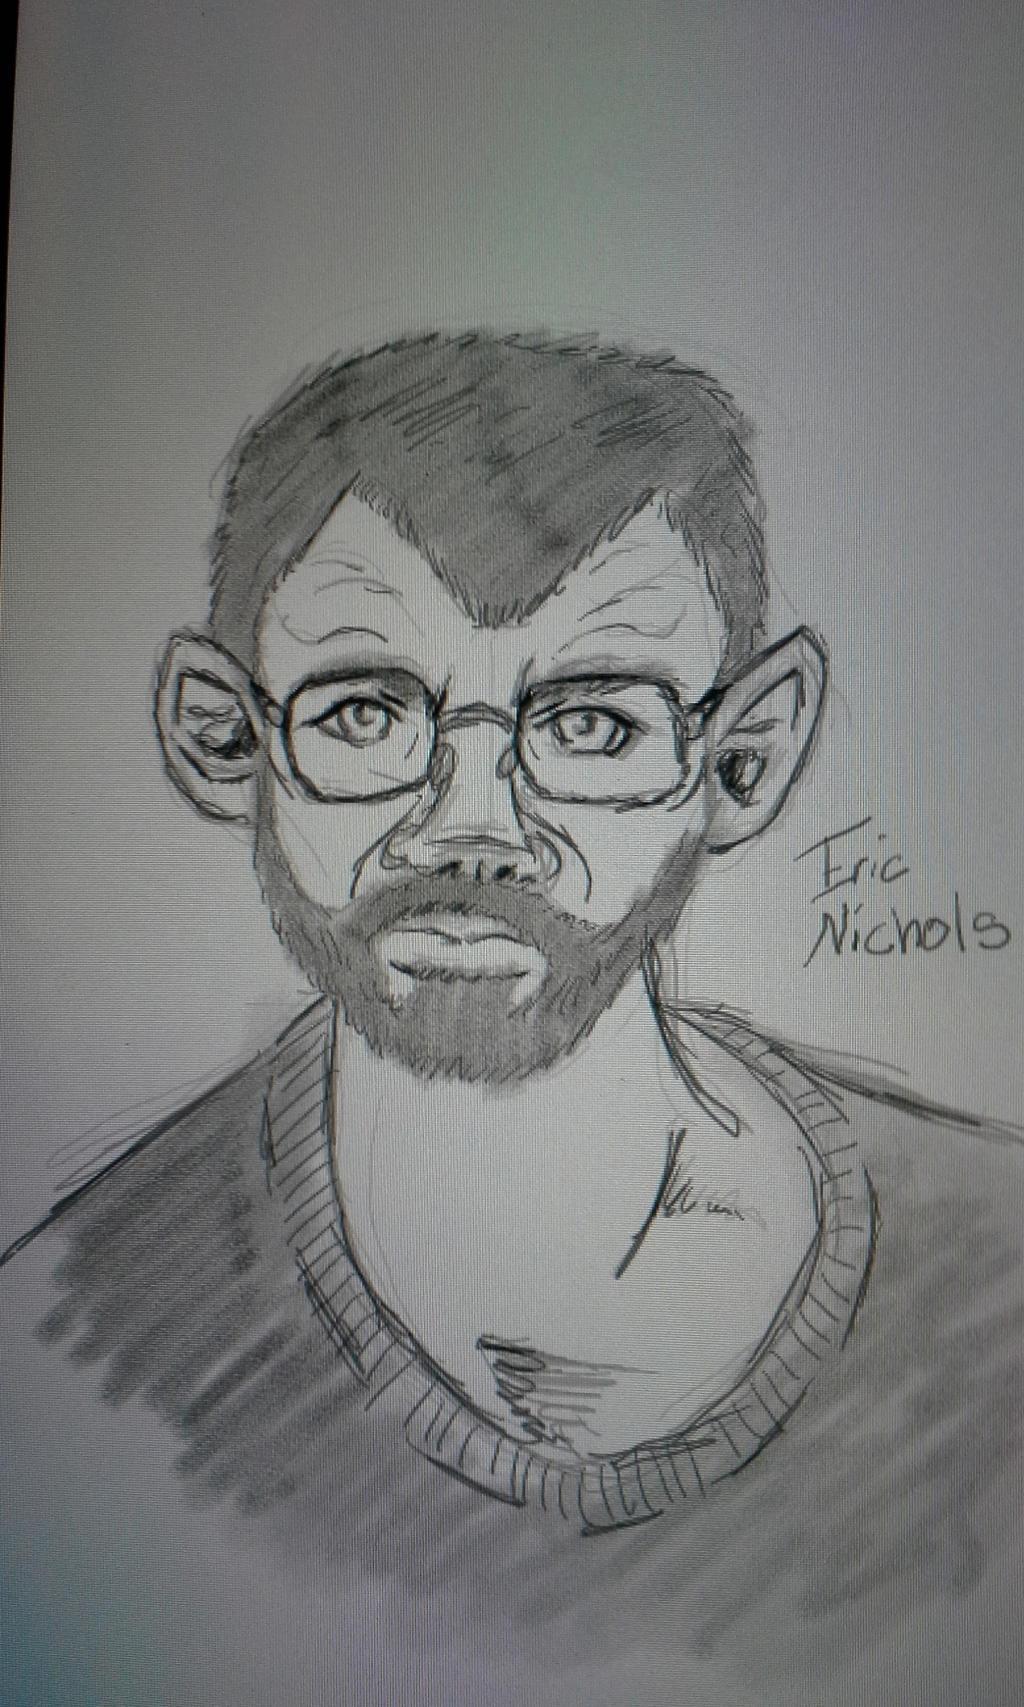 Eric Nichols Portrit by blackzero04